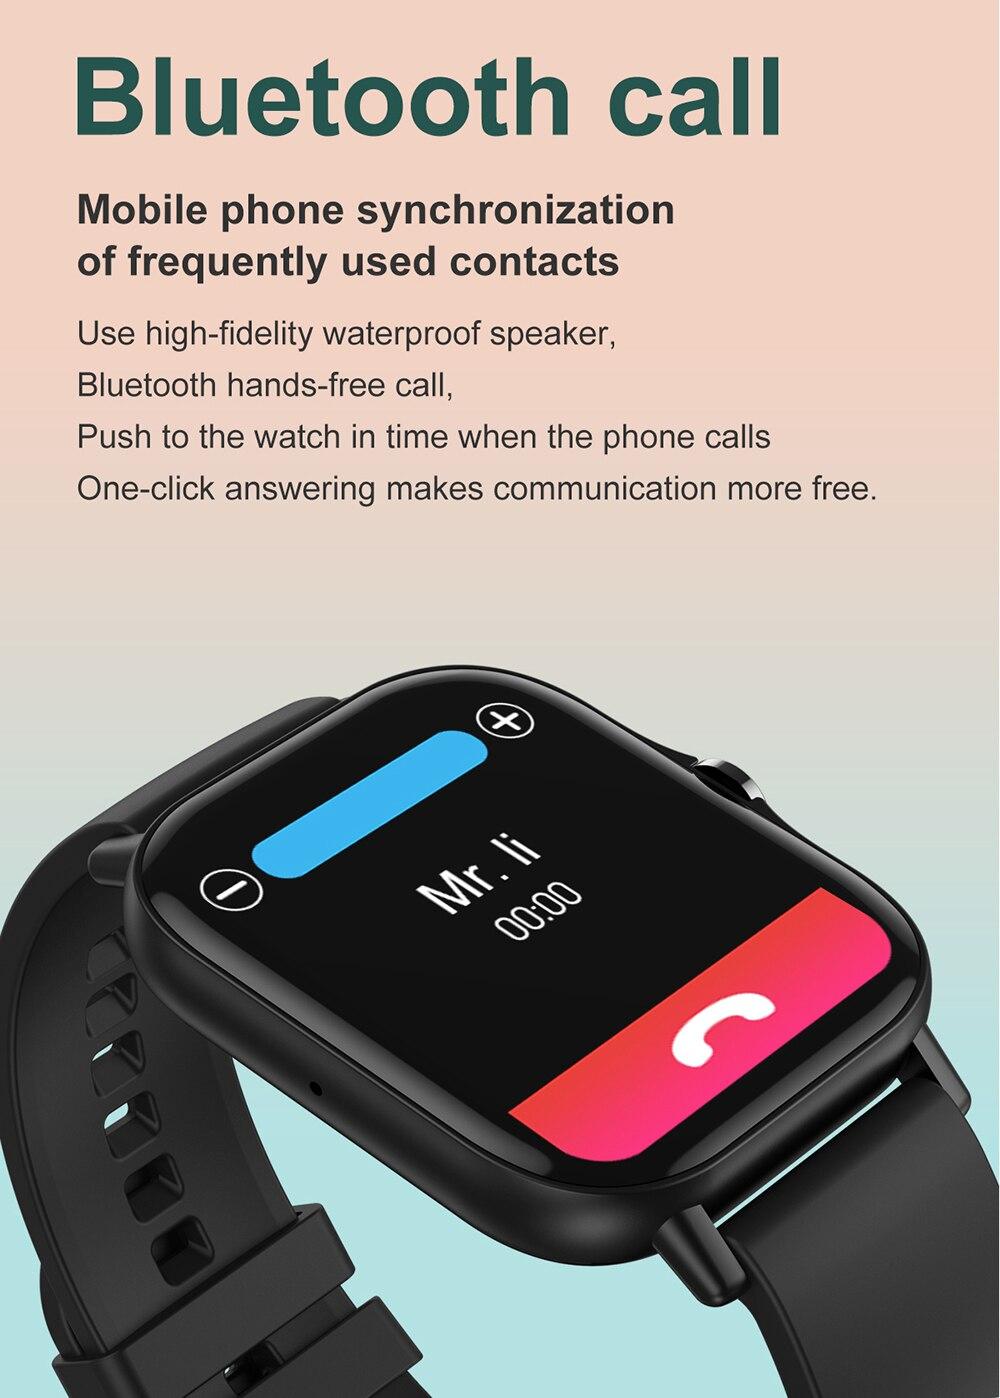 H6c2bdce8027f4baa821b3420bfc967f3o For Xiaomi Apple Phone IOS Reloj Inteligente Hombre Smartwatch 2021 Men Bluetooth Call Smart Watch Man Woman Full Touch IP68